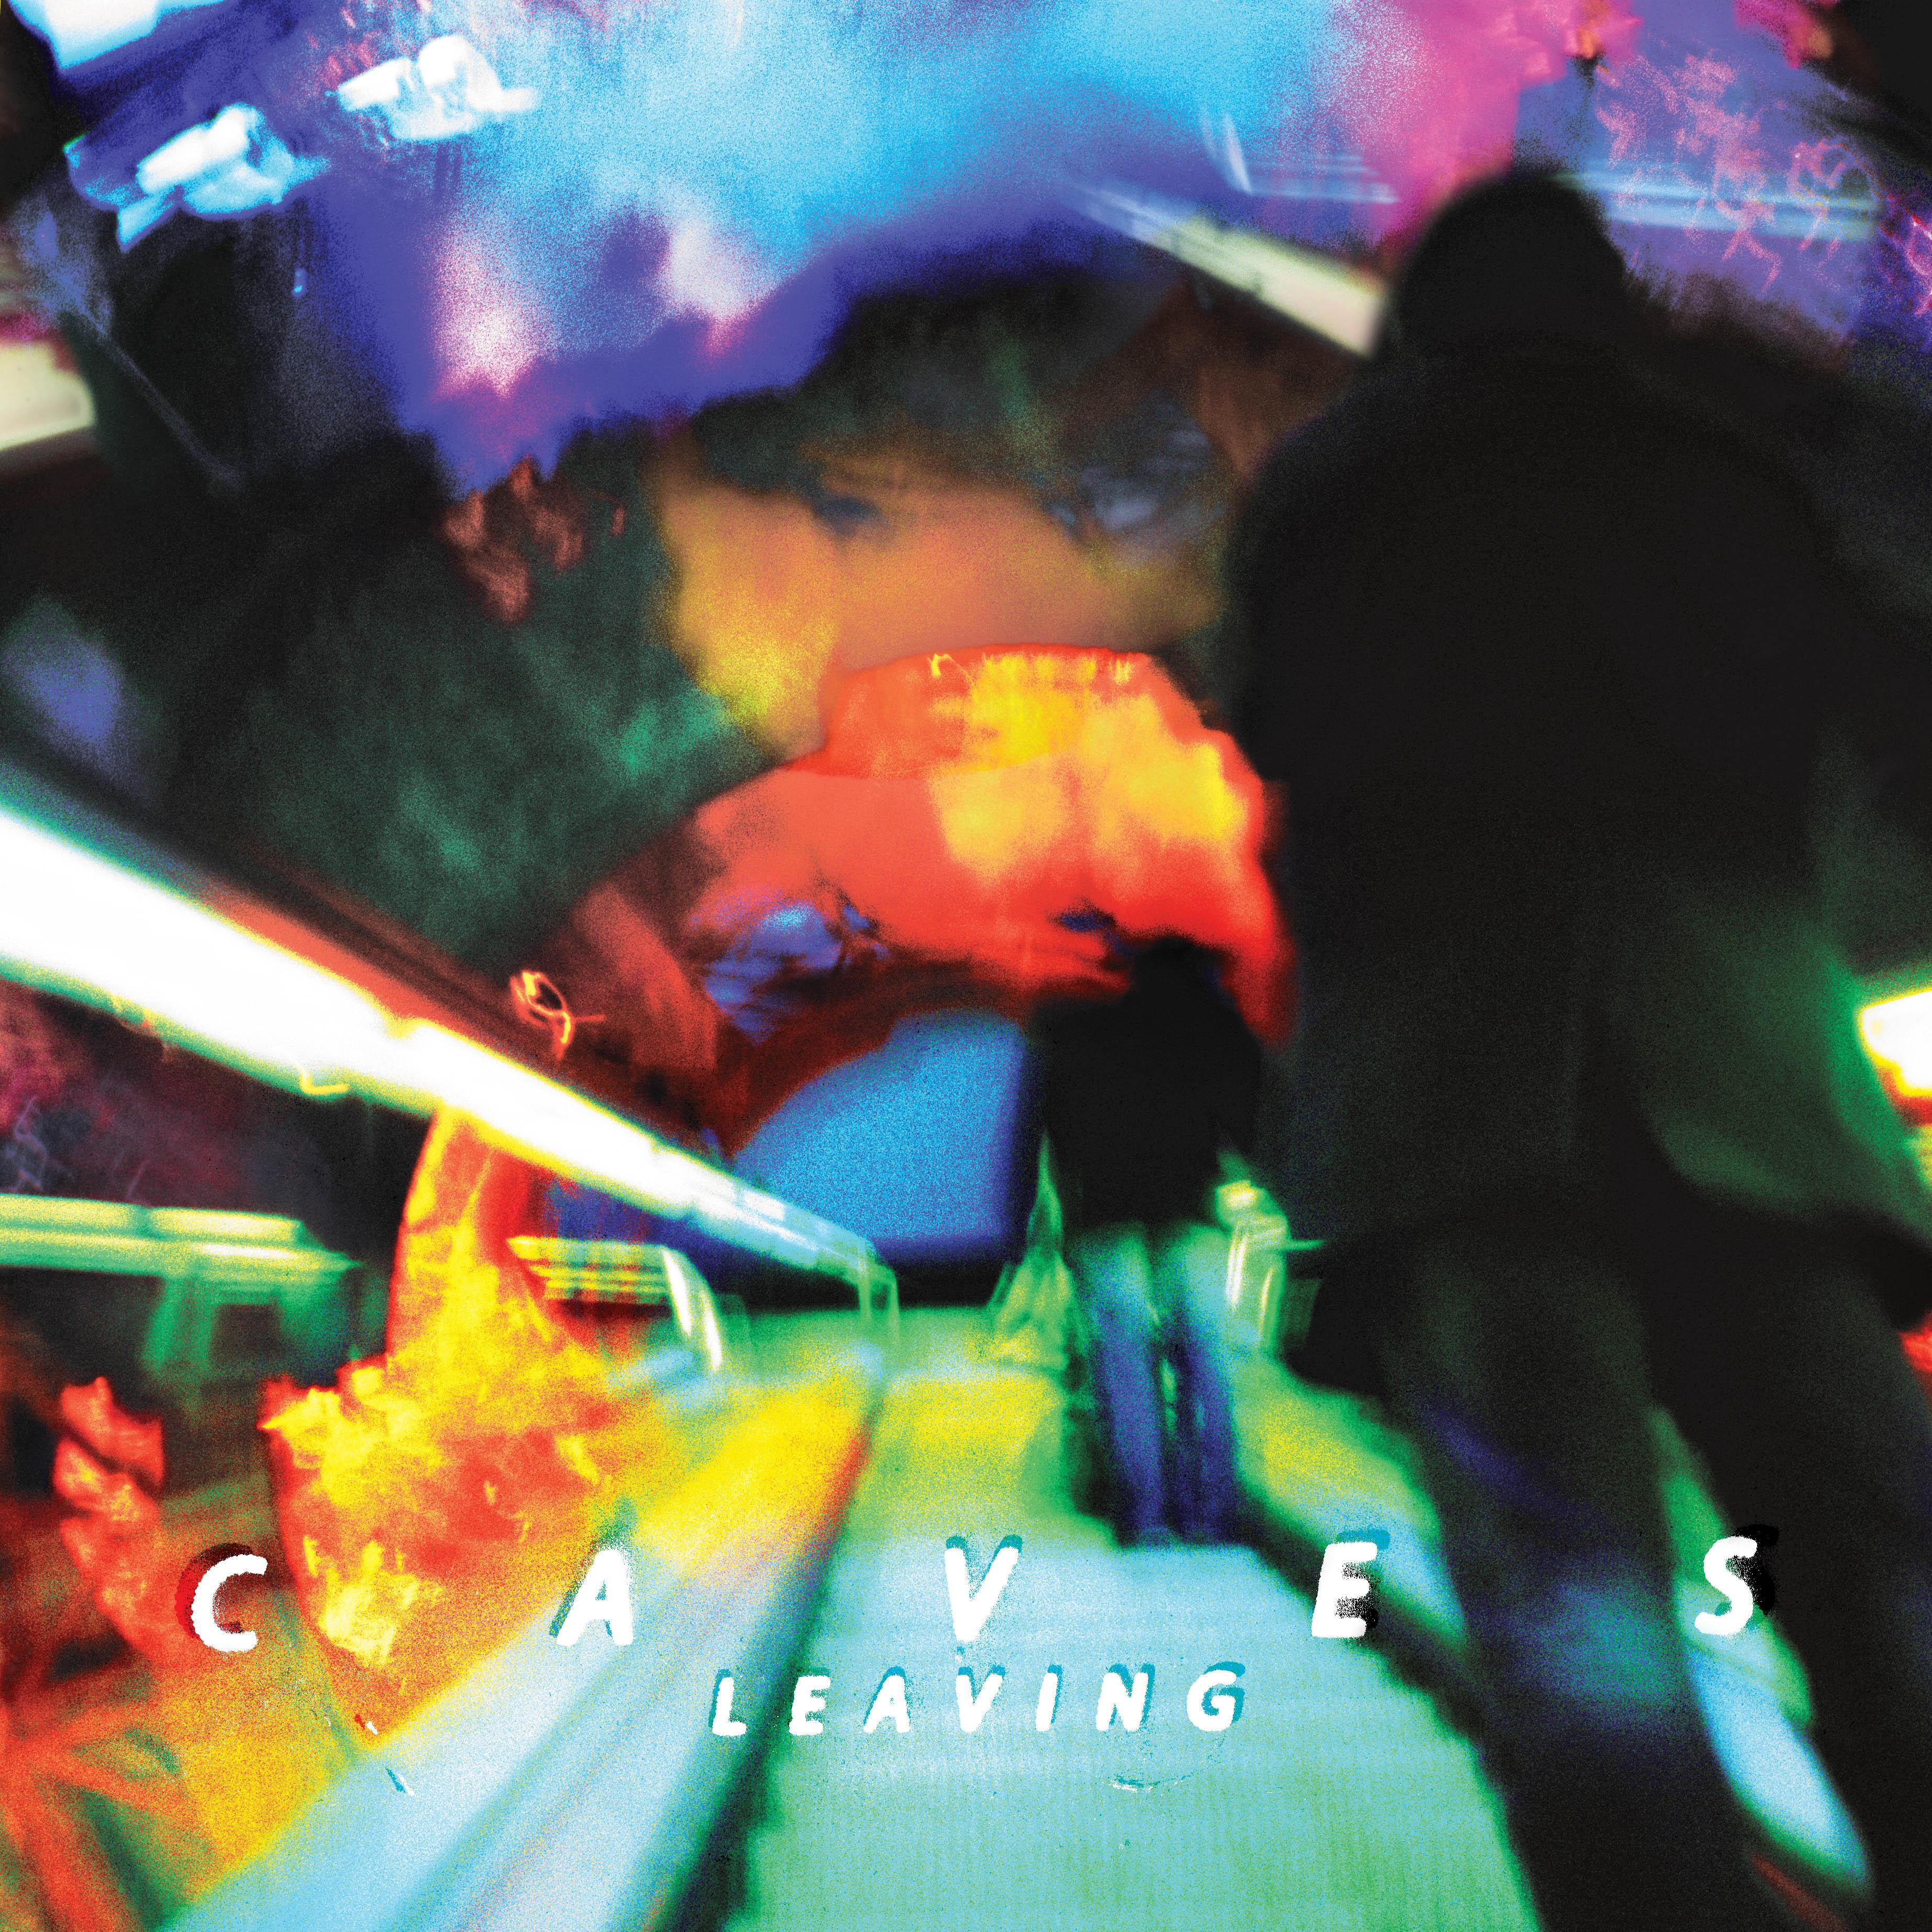 Caves - Leaving 12